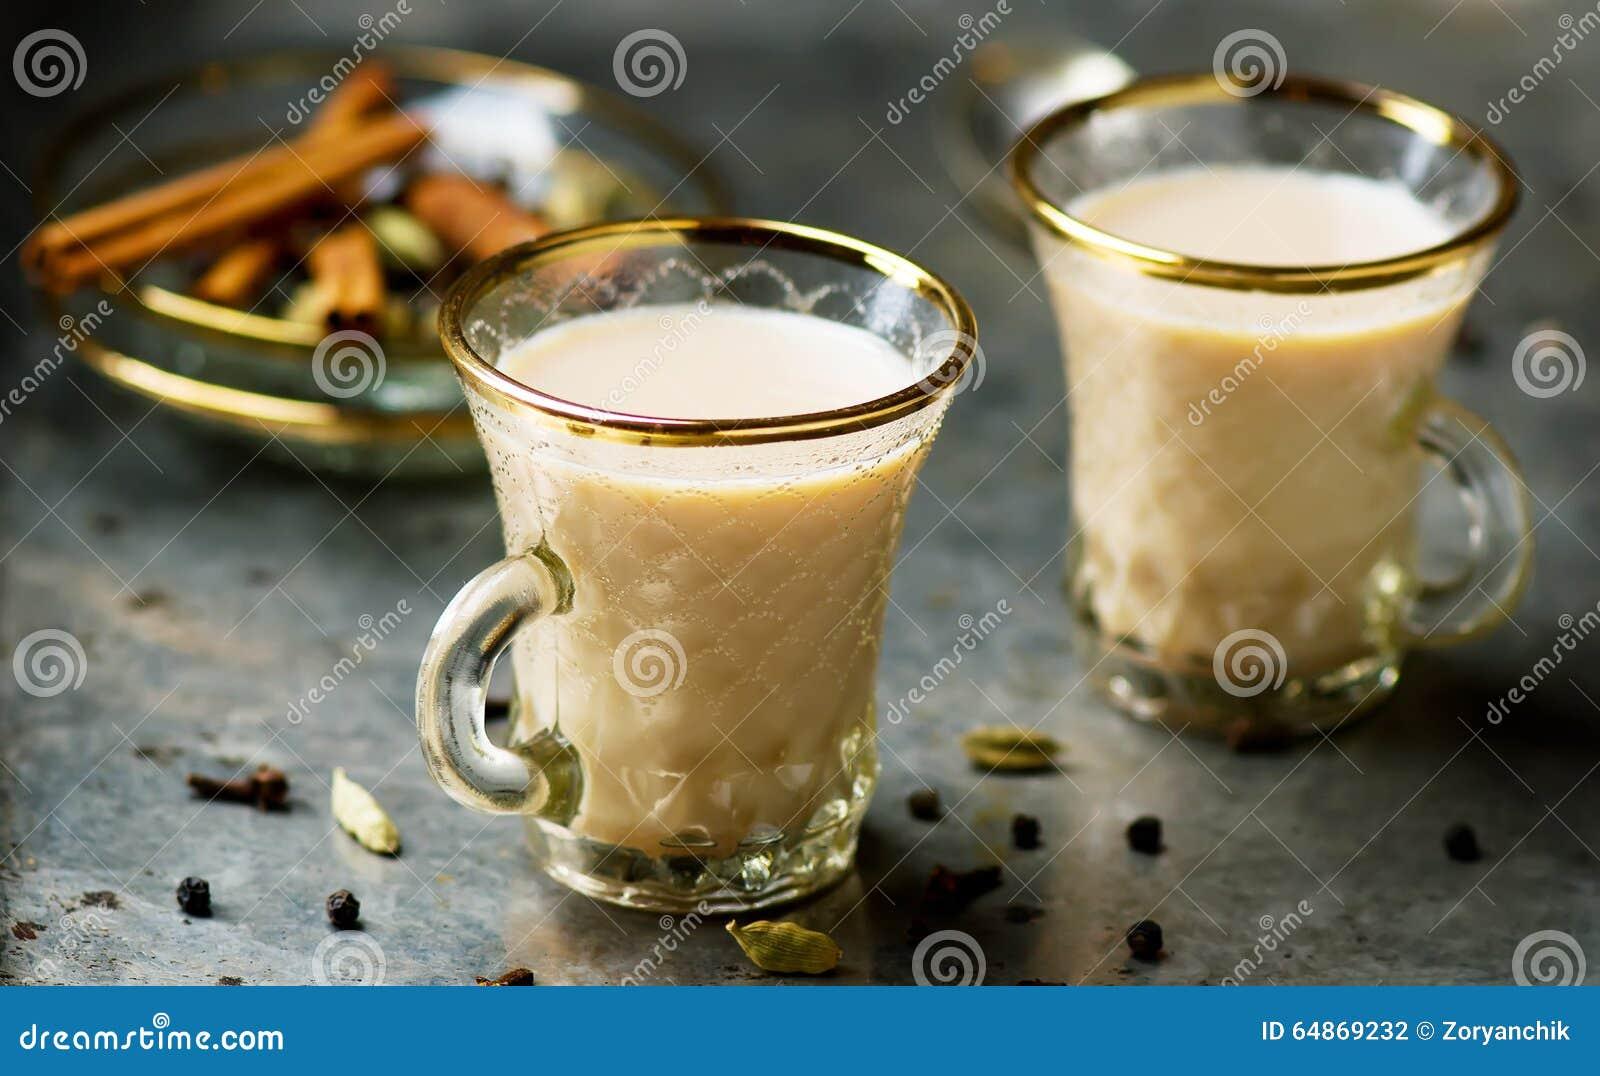 Indian Tea Royalty-Free Stock Photo